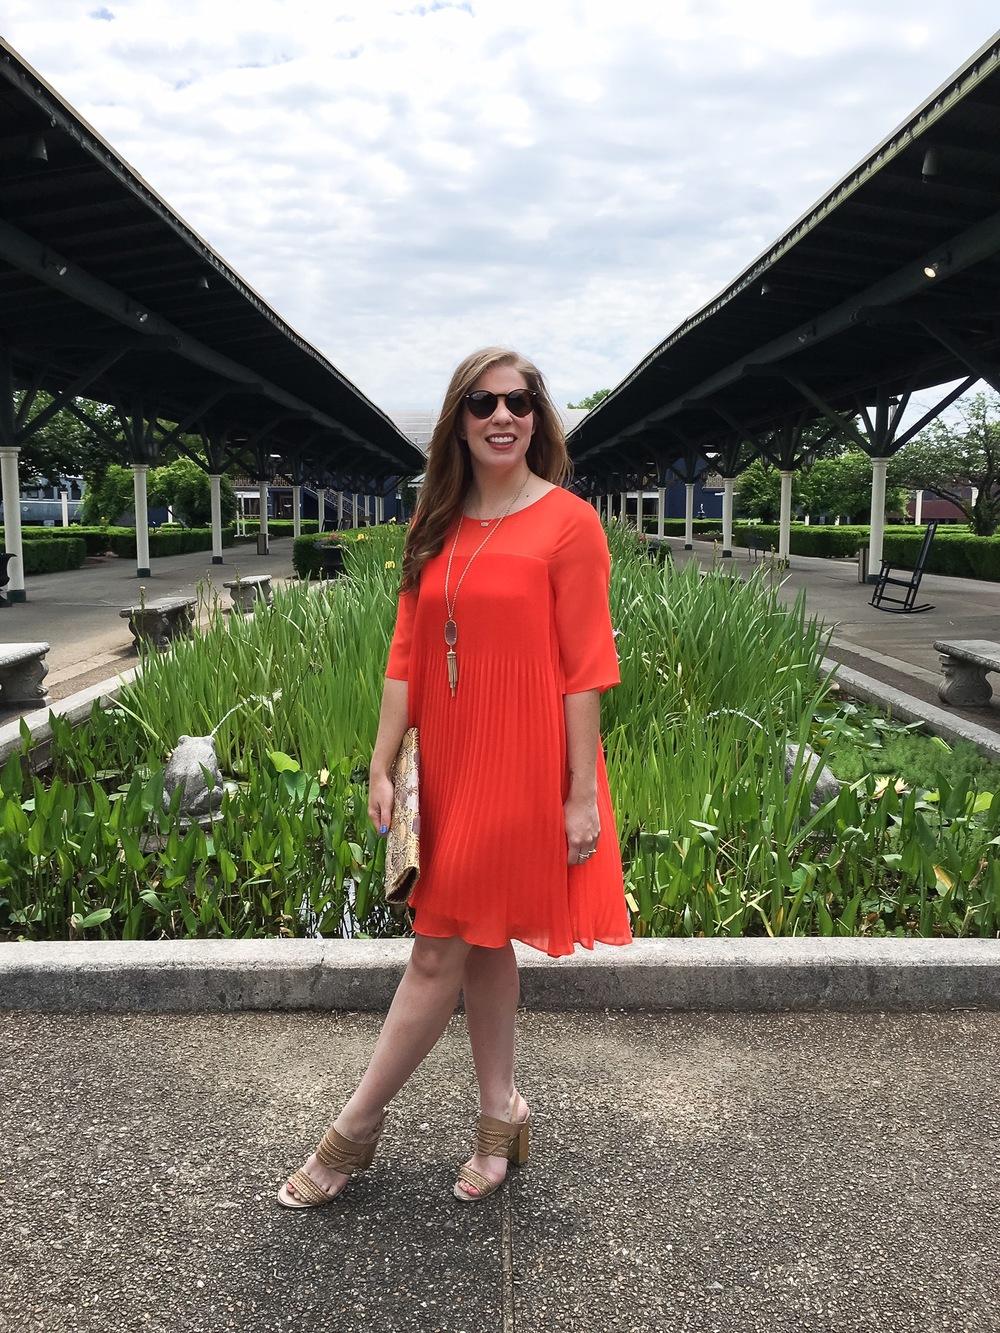 anthropologie orange dress swing